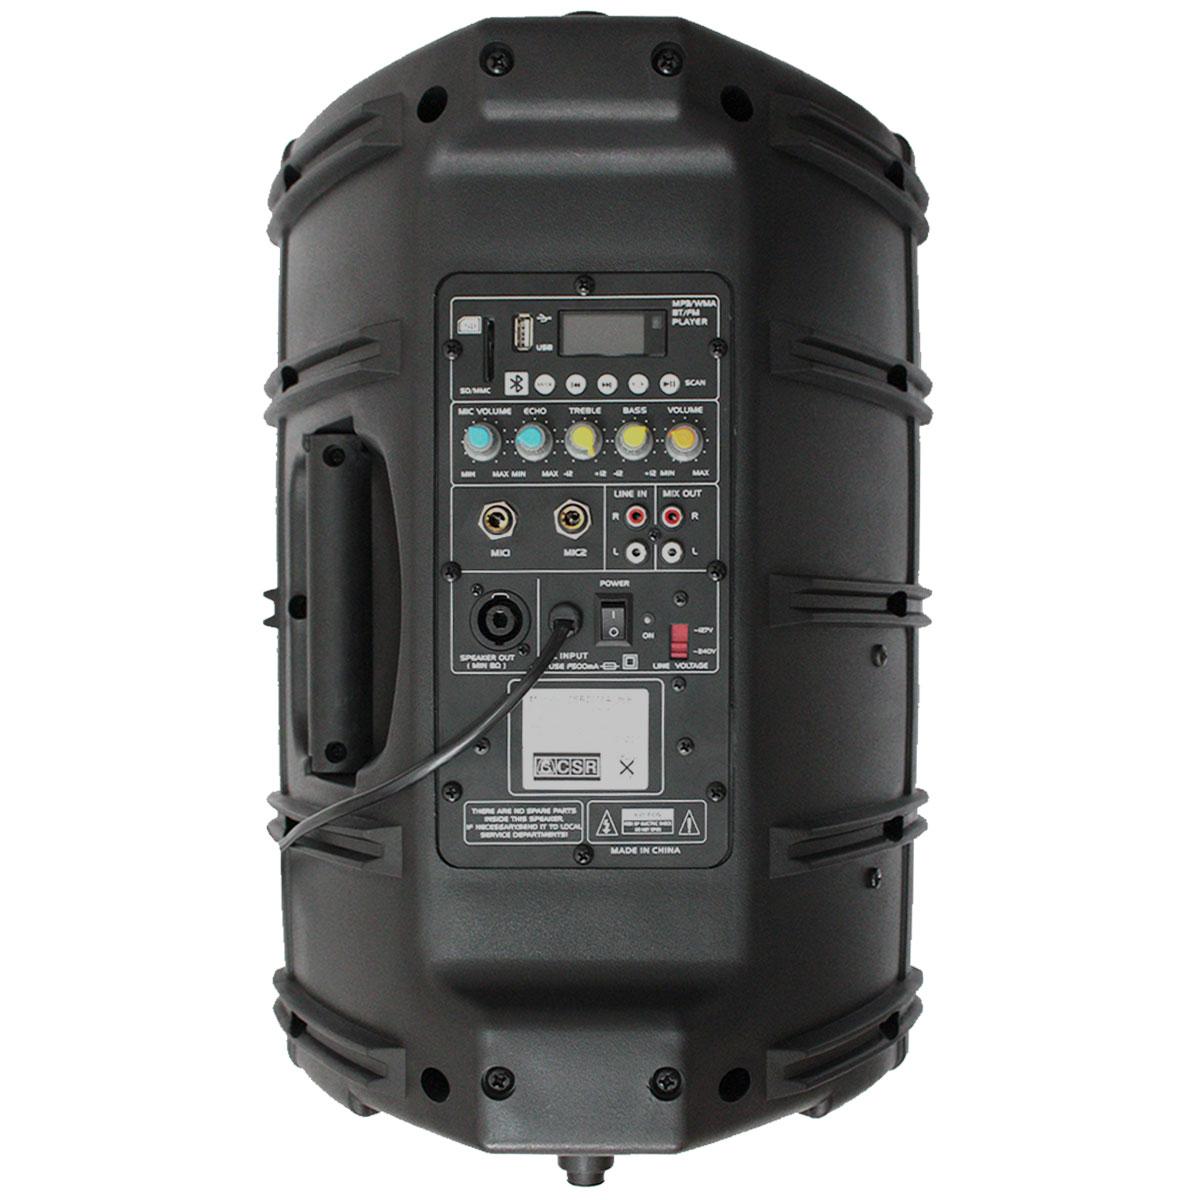 Caixa Ativa 100W c/ Bluetooth e USB CSR 2500A USB BT - CSR